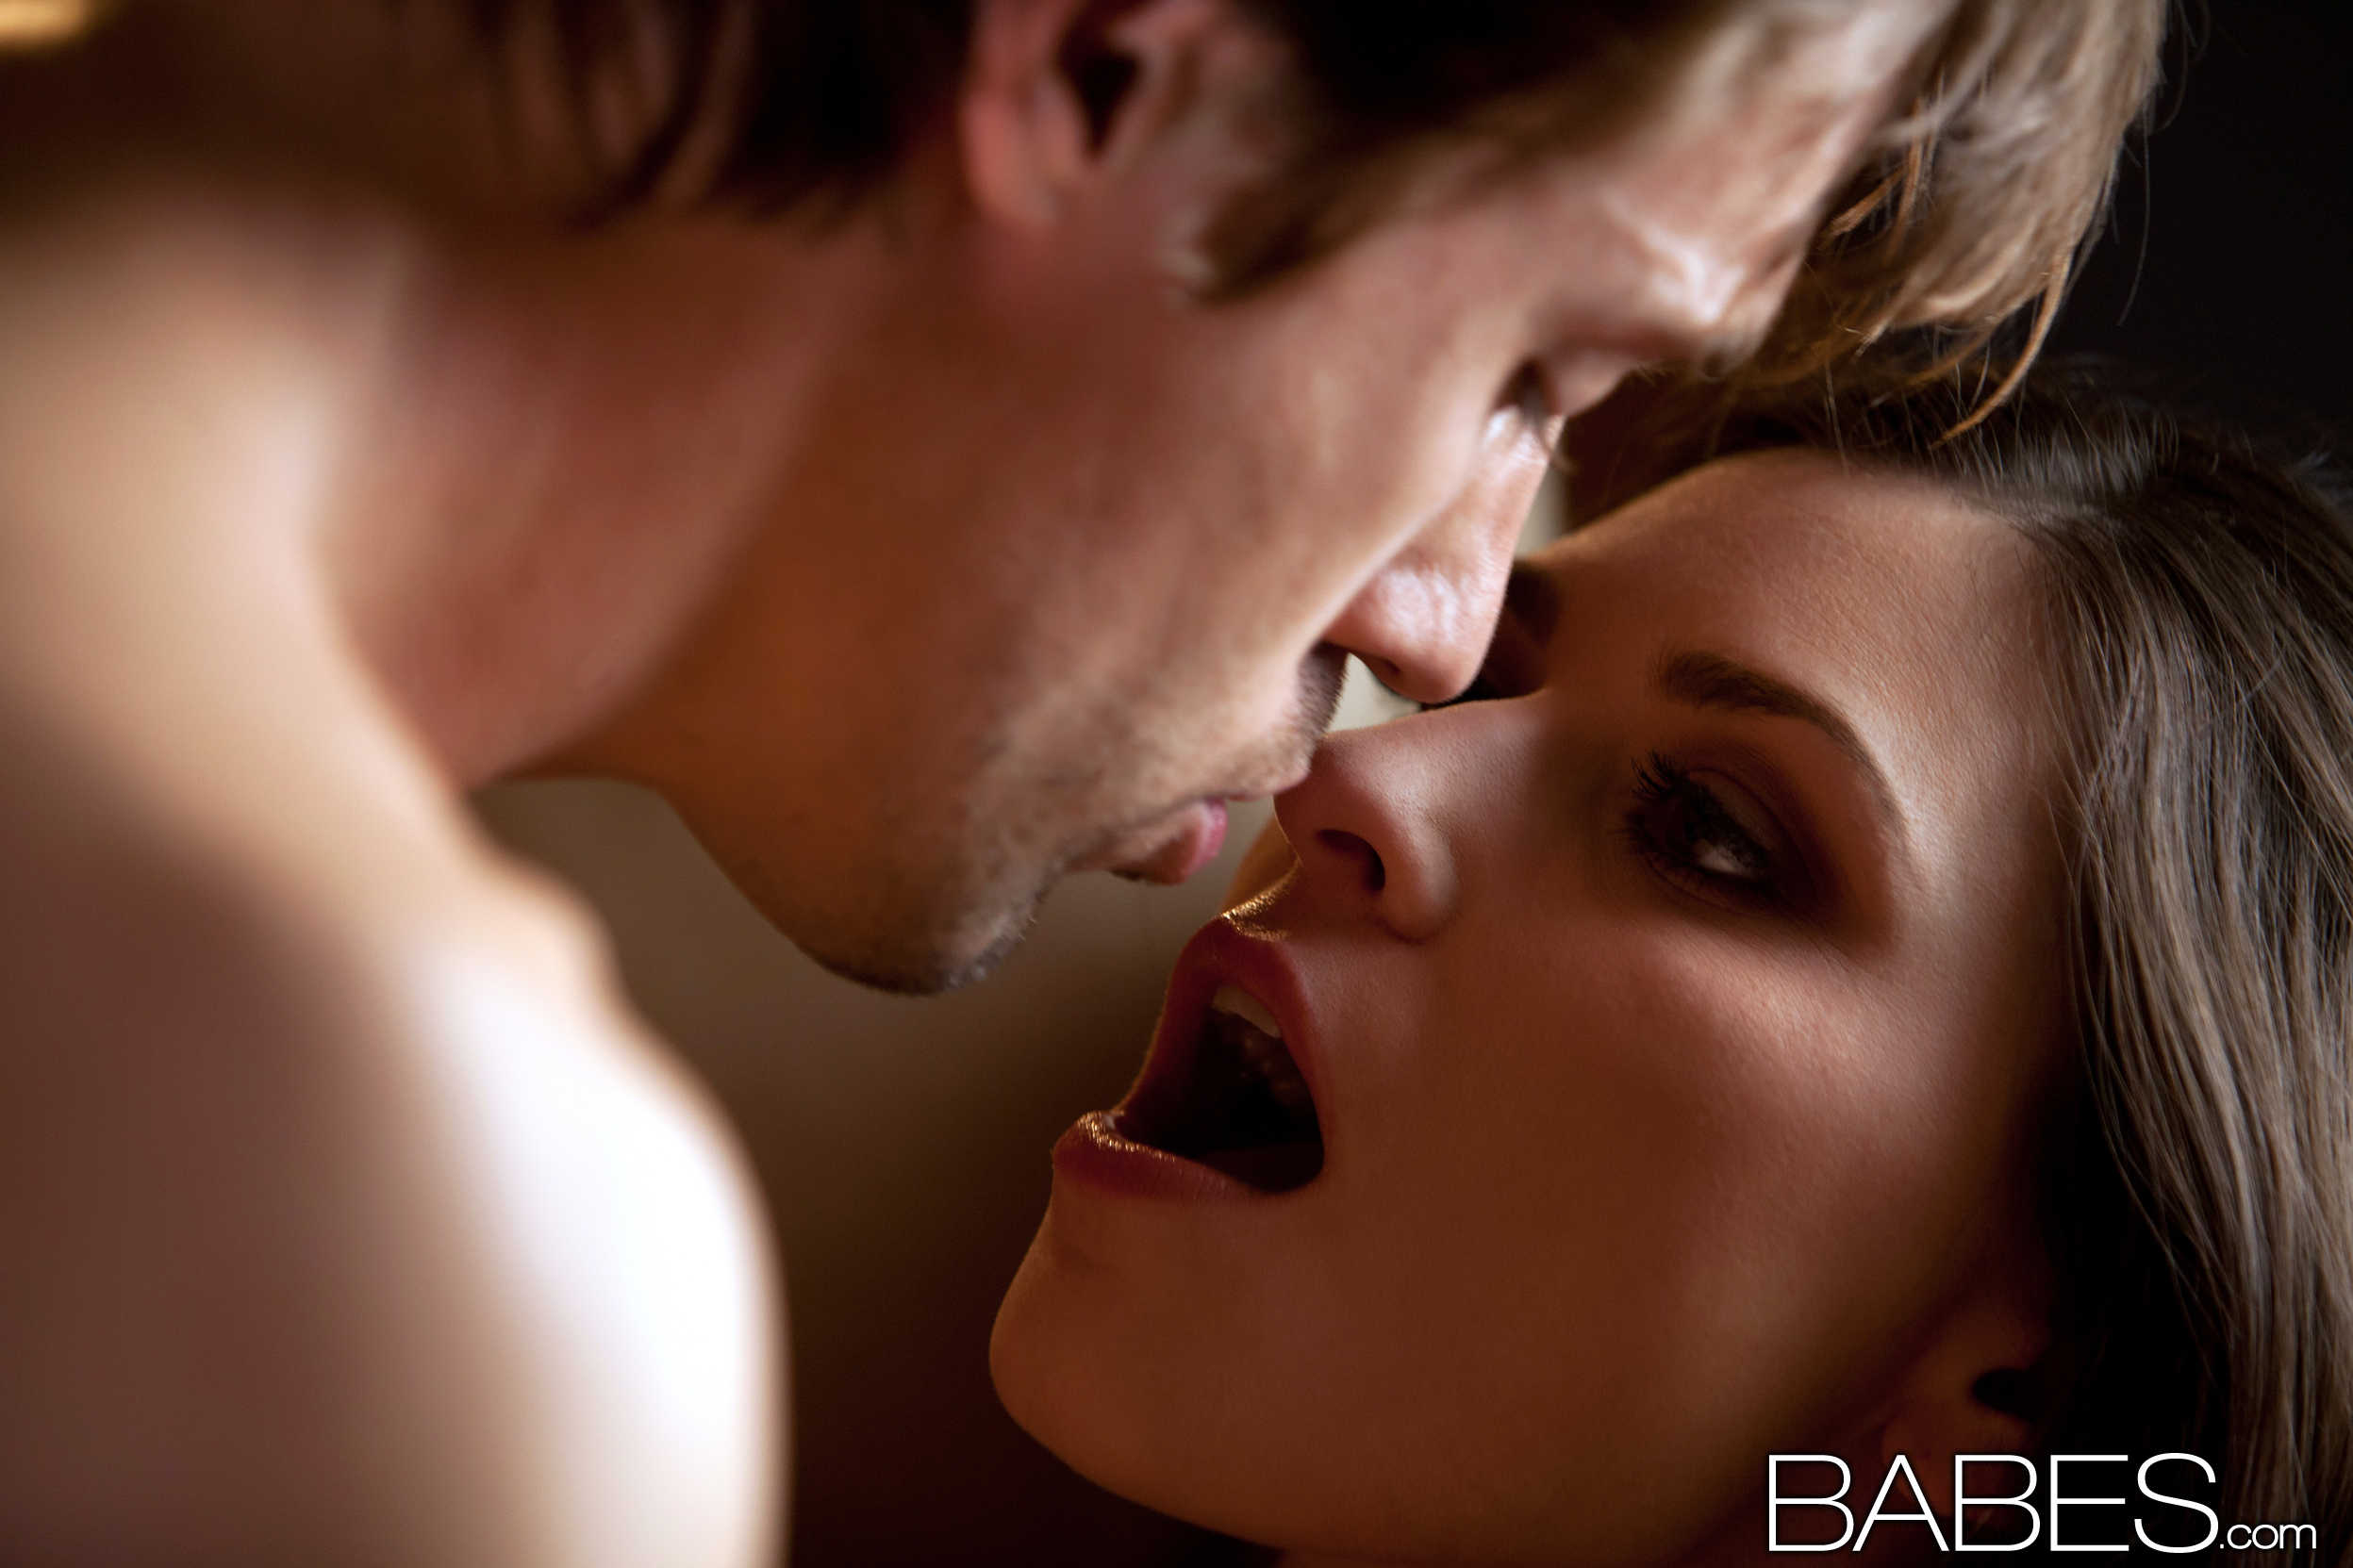 image Babescom after dark romance victoria lawson